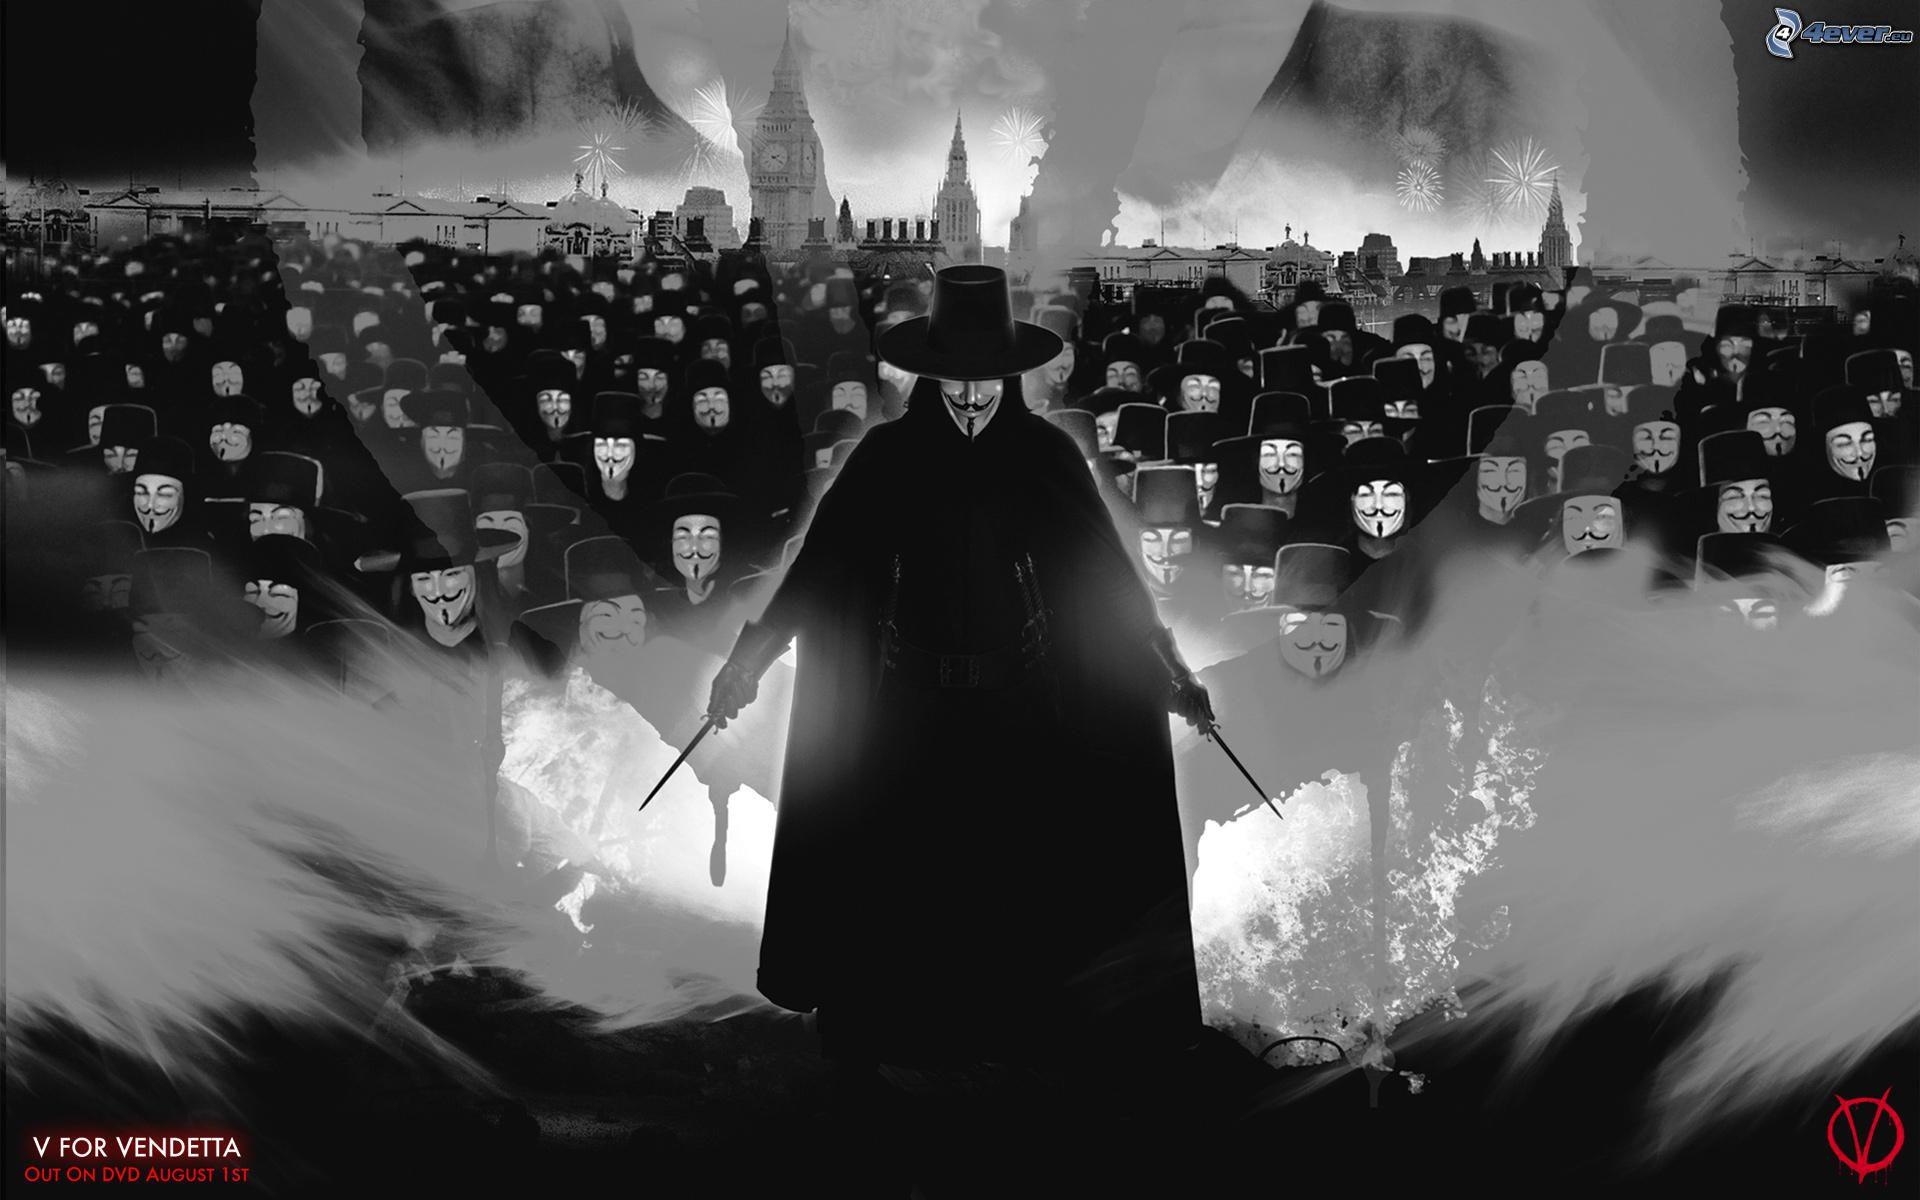 V For Vendetta Movie Review Essay